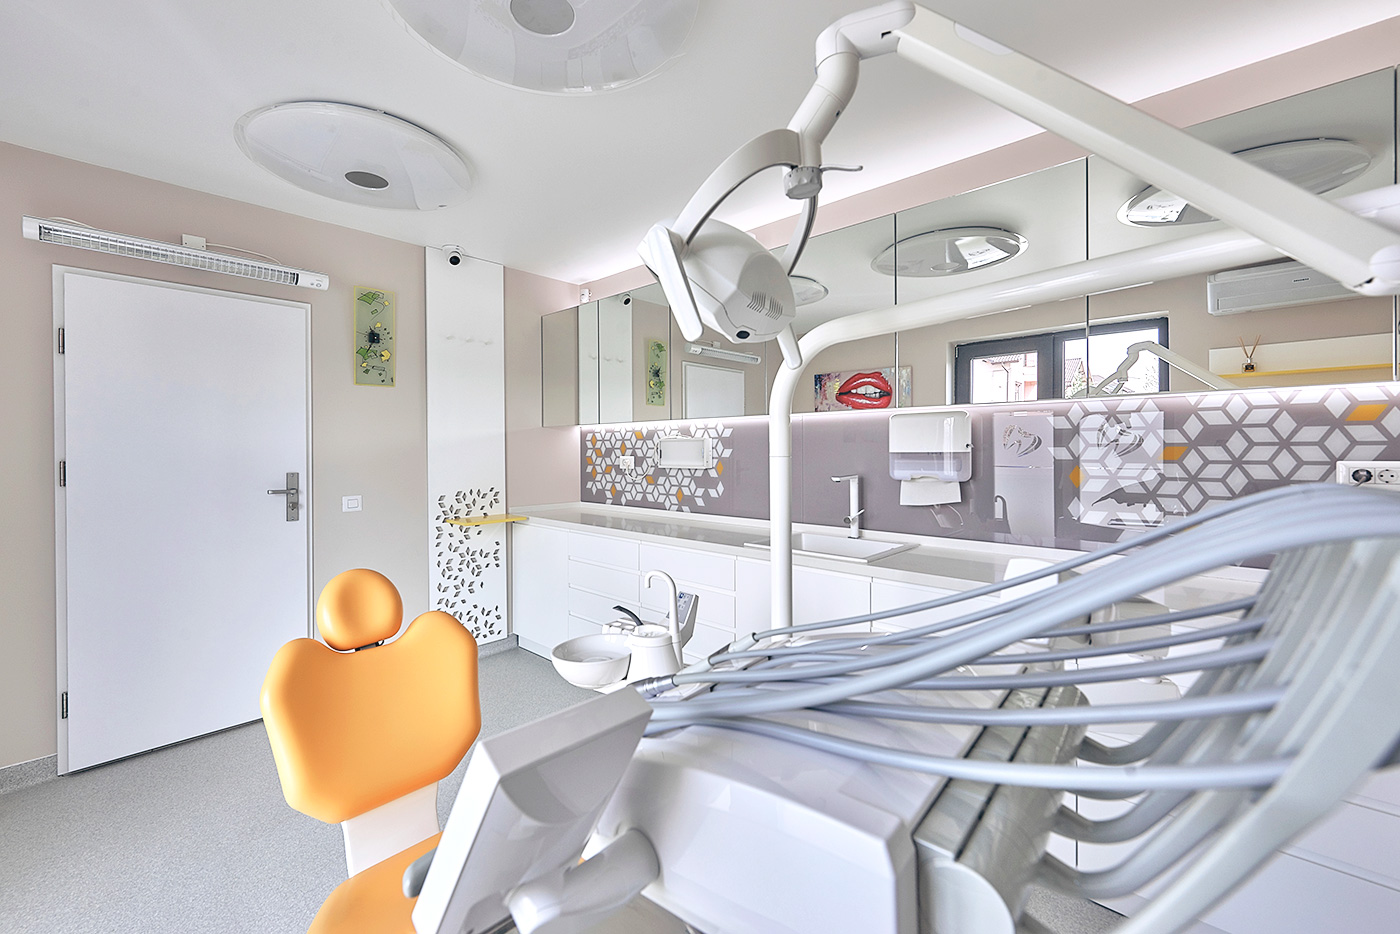 Clinica Ogodent Ploiesti - servicii stomatologice premium